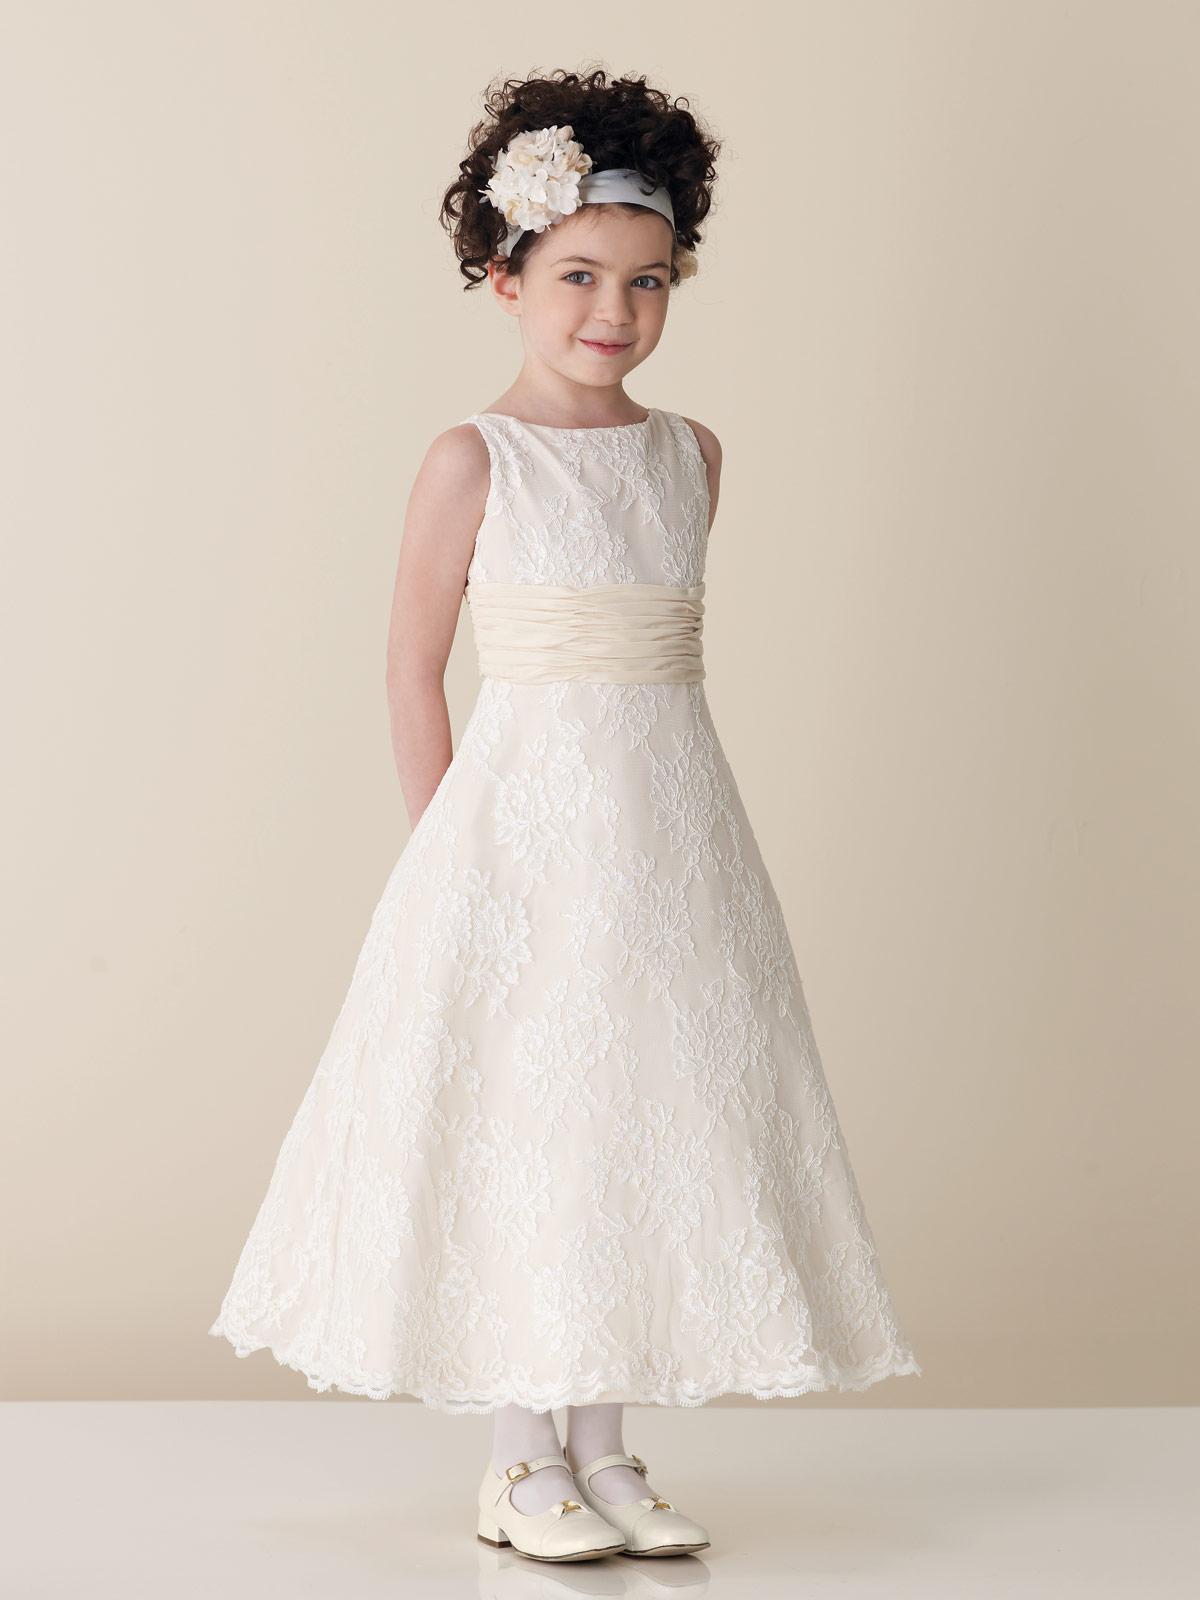 Free Wedding: Kids Wedding Dresses